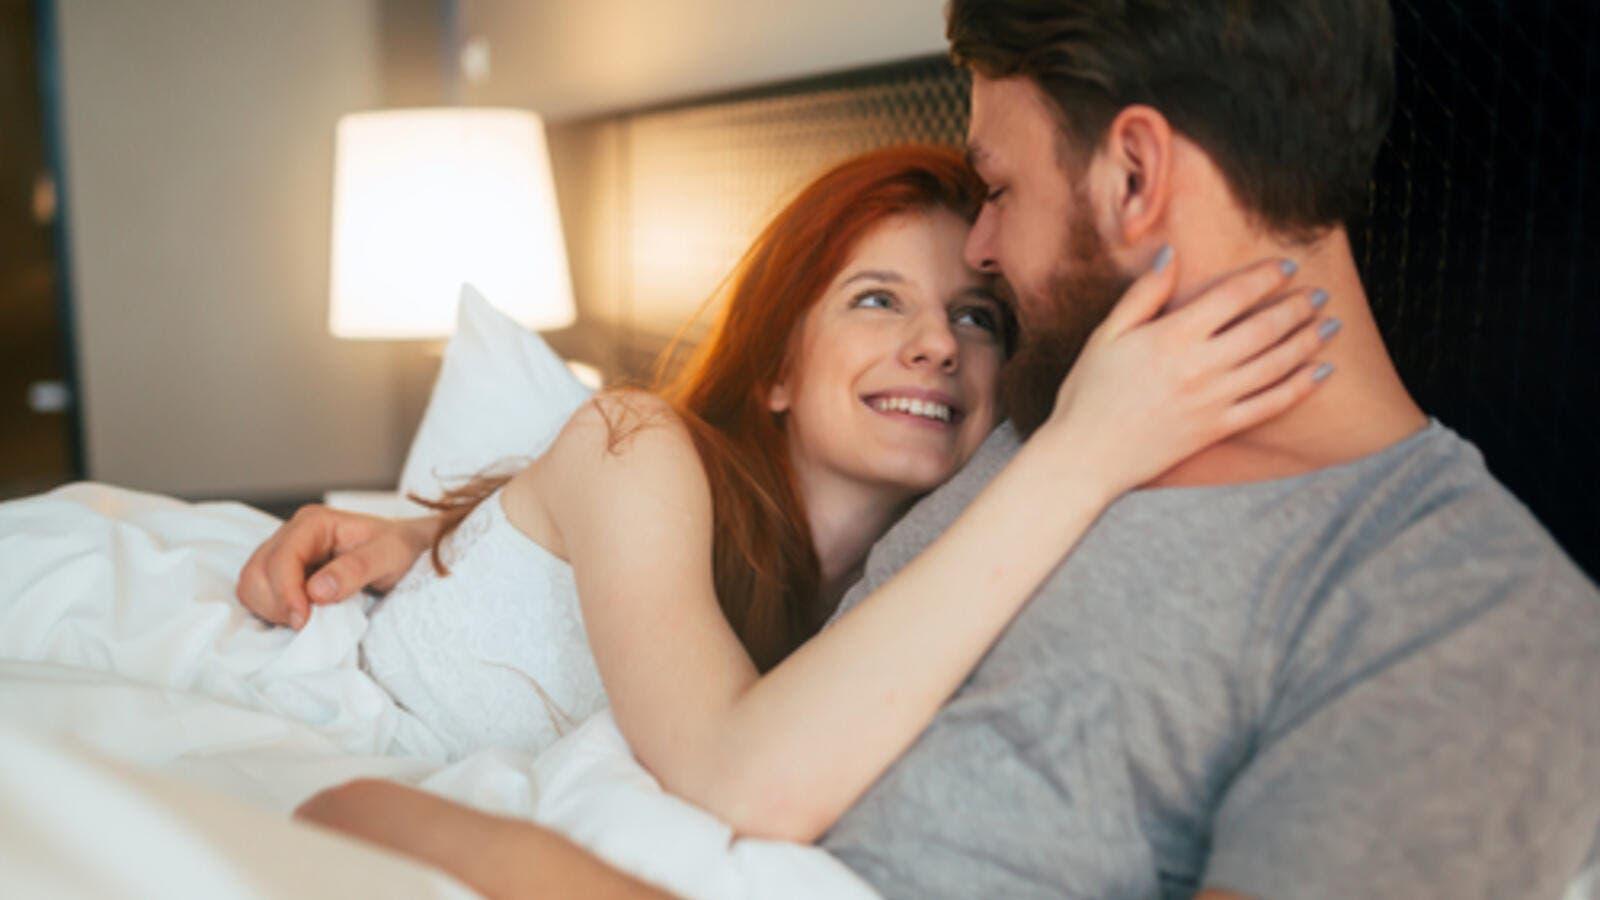 54735ad83 سر نجاح العلاقة الجنسية أربع أسرار فقط! | البوابة